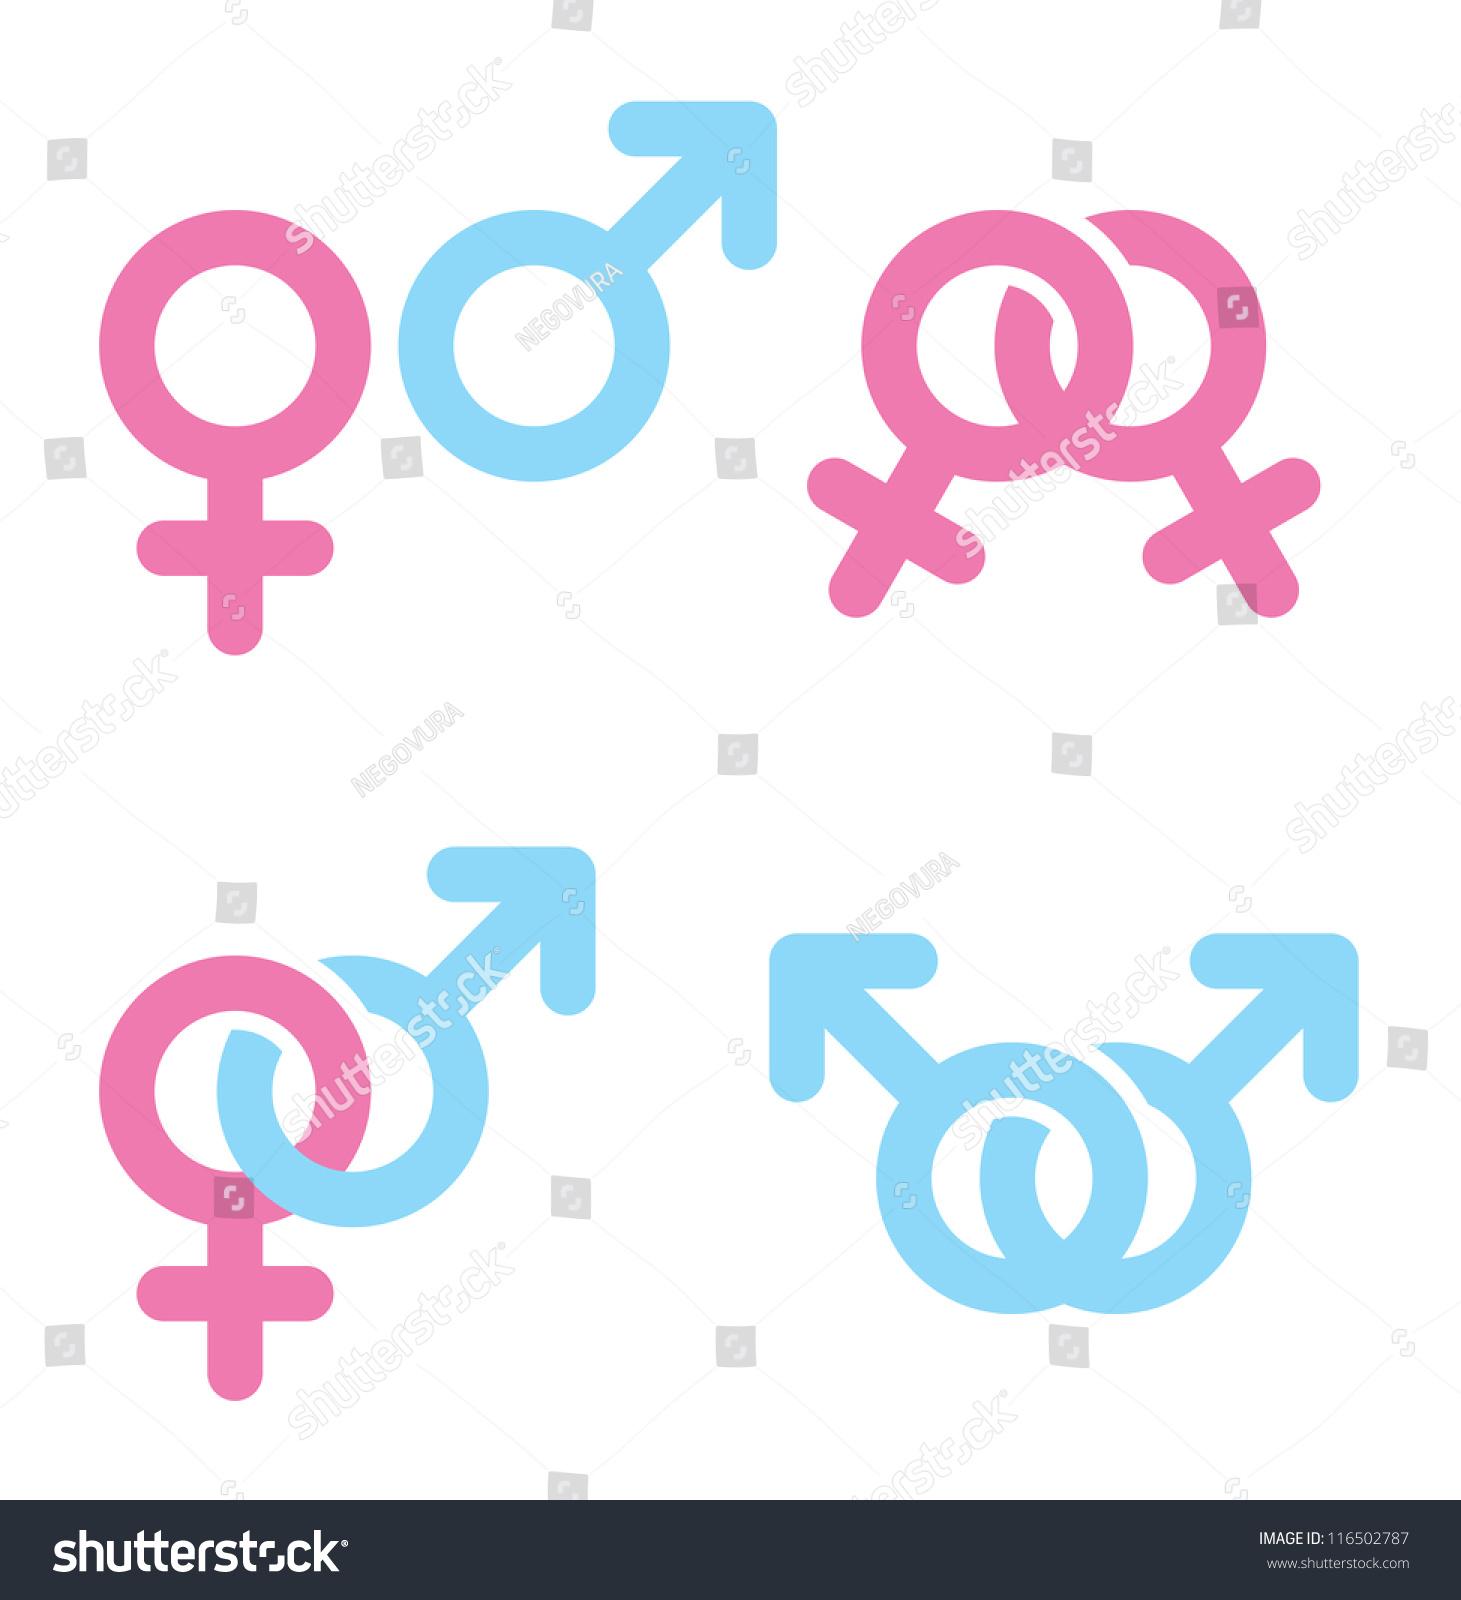 Royalty Free Stock Illustration Of Male Female Symbols Combination